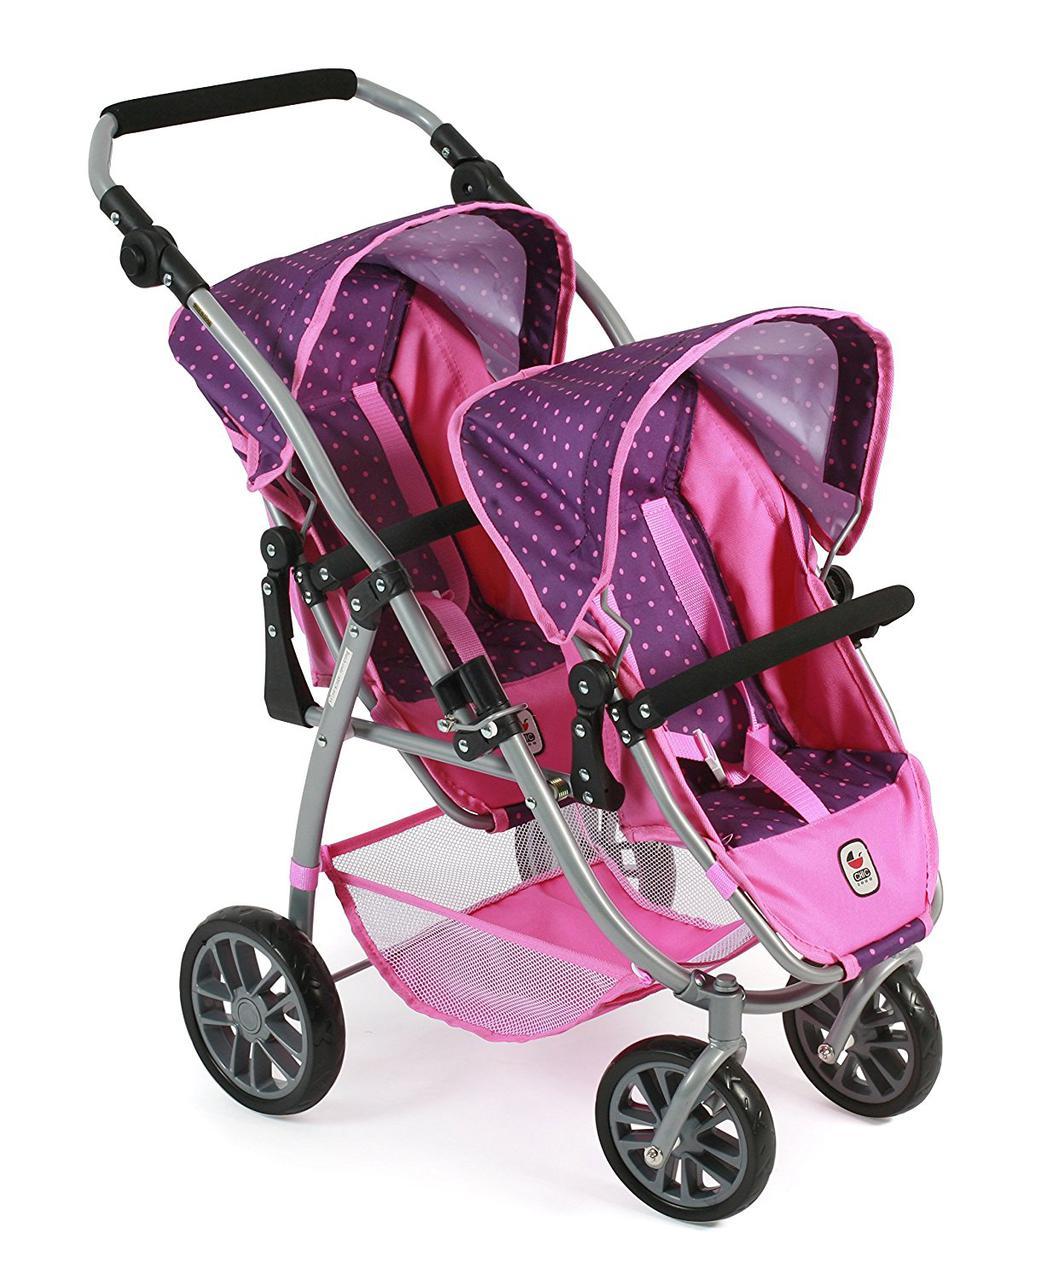 Коляска тандем для кукол для двойни фиолетово-розовая Байер Tandem-Buggy Chic 2000 Bayer 68940